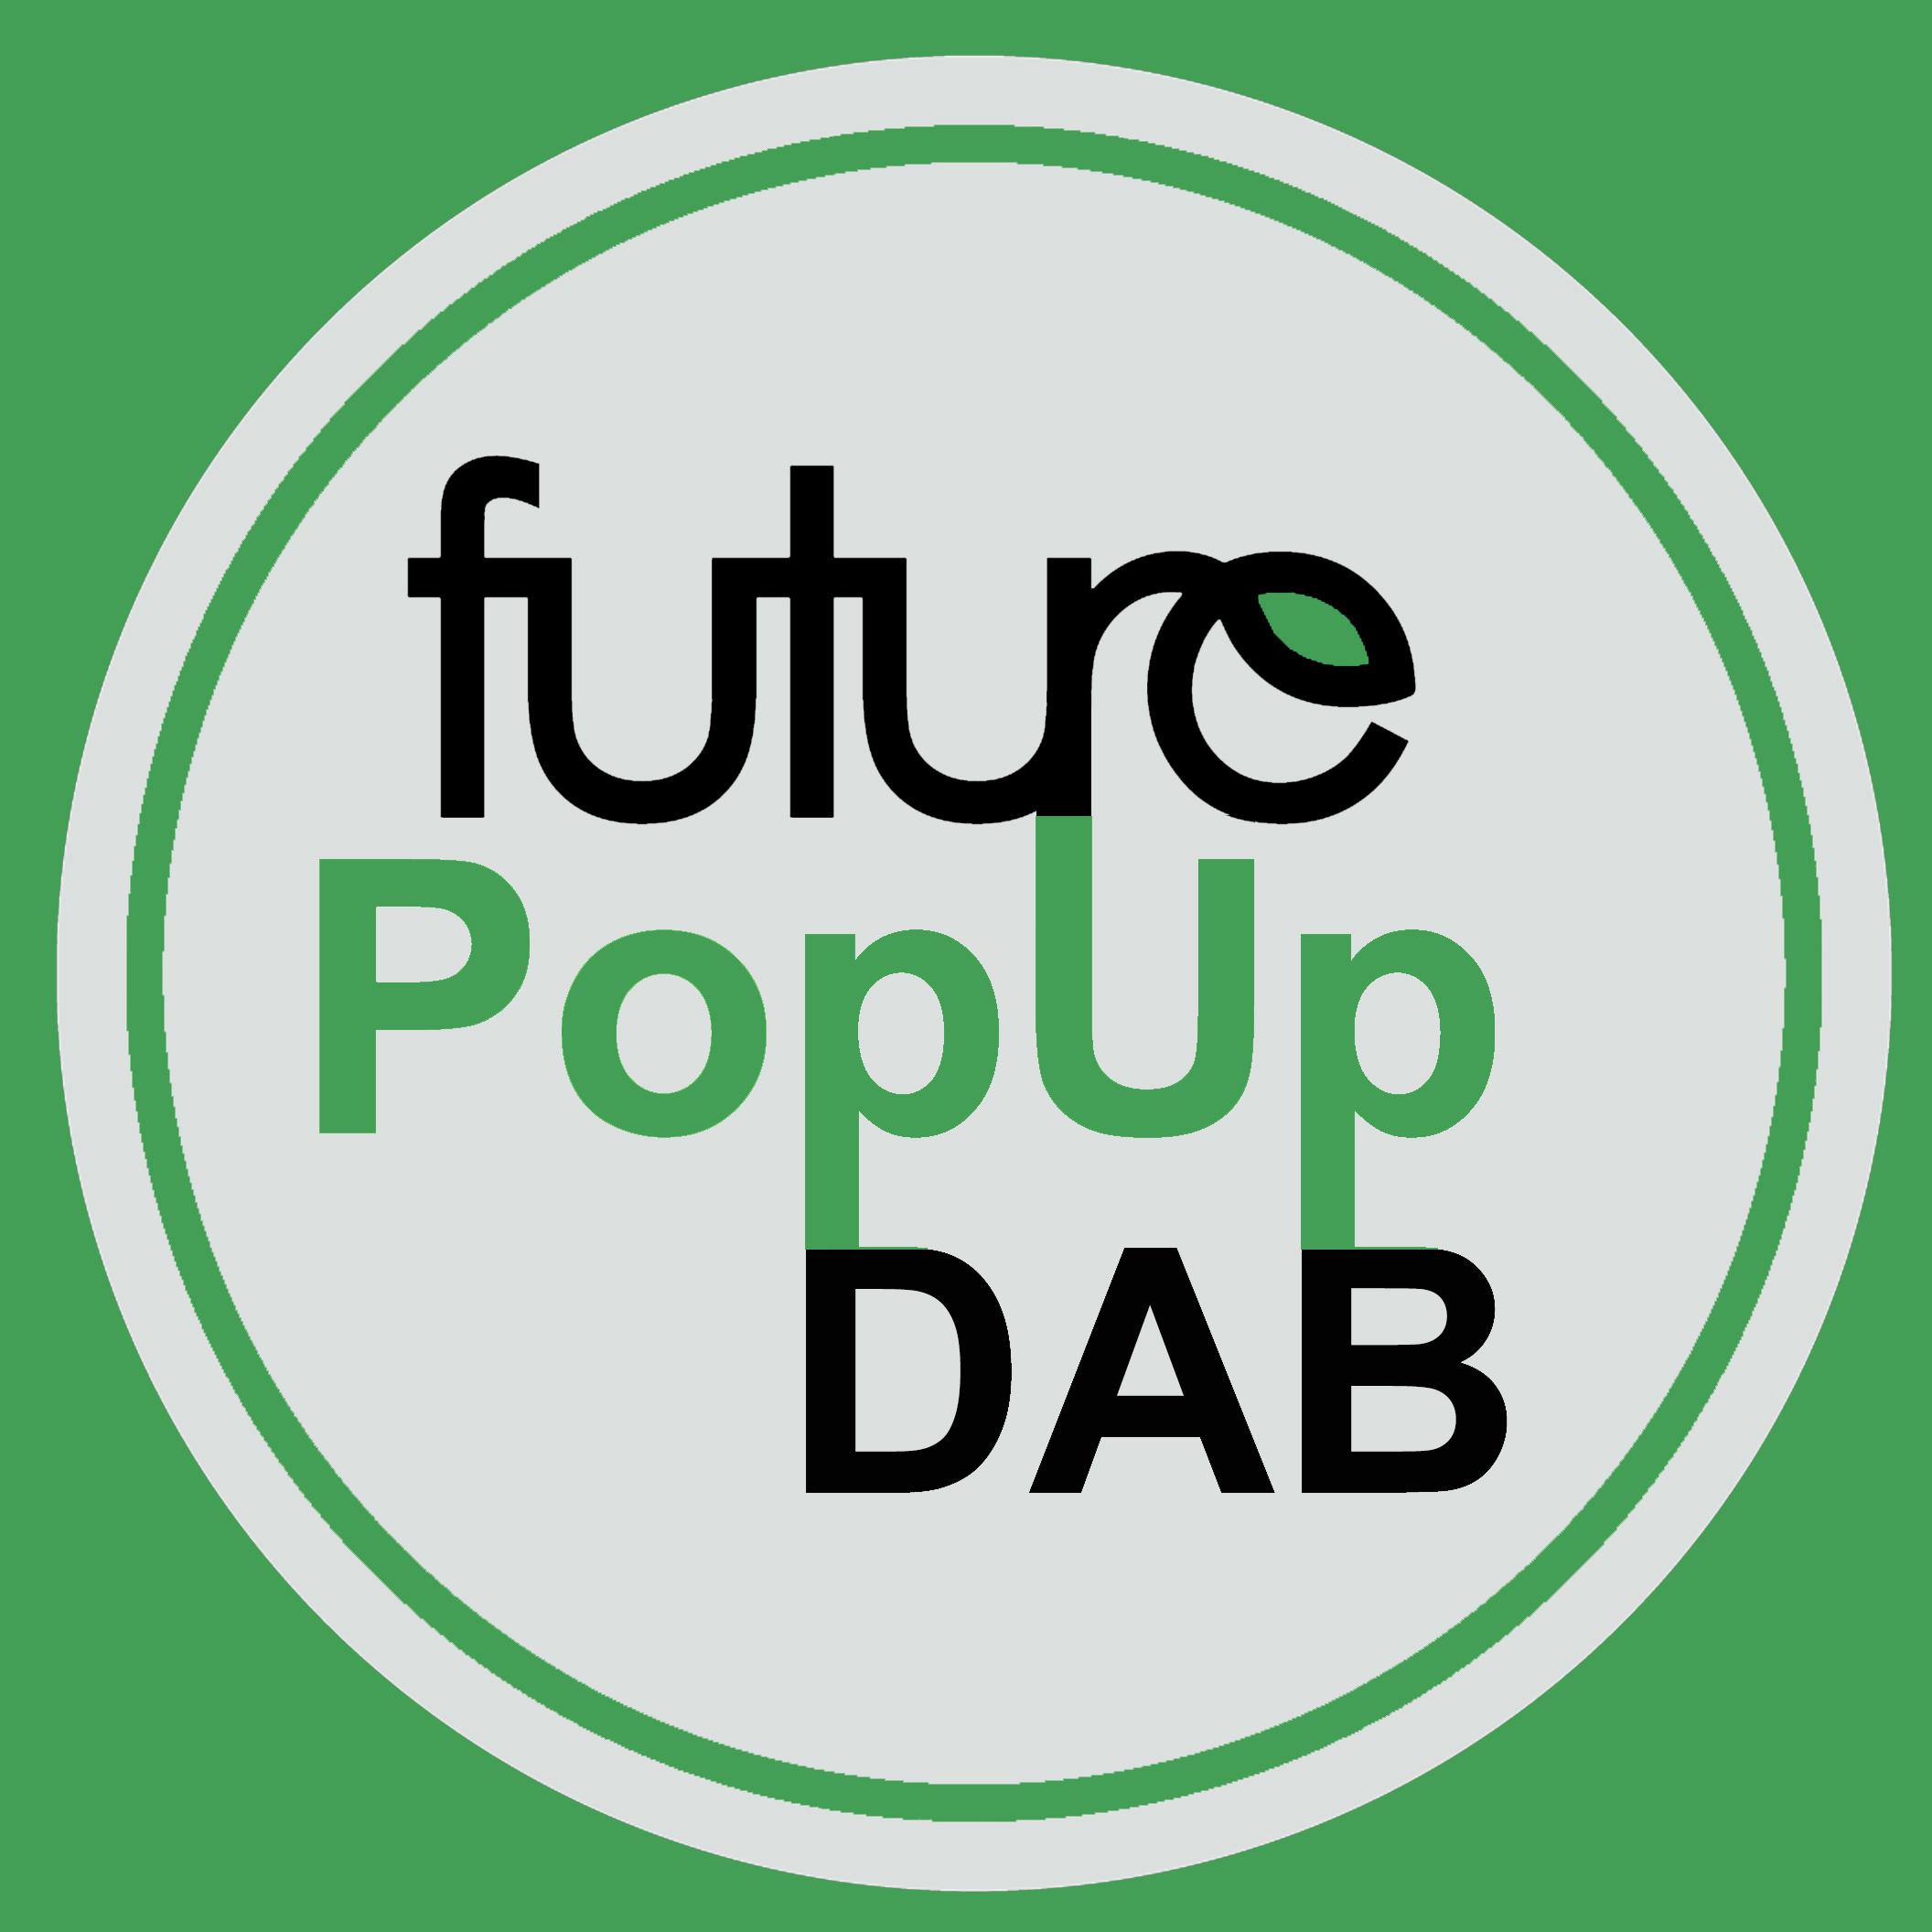 Future PopUp